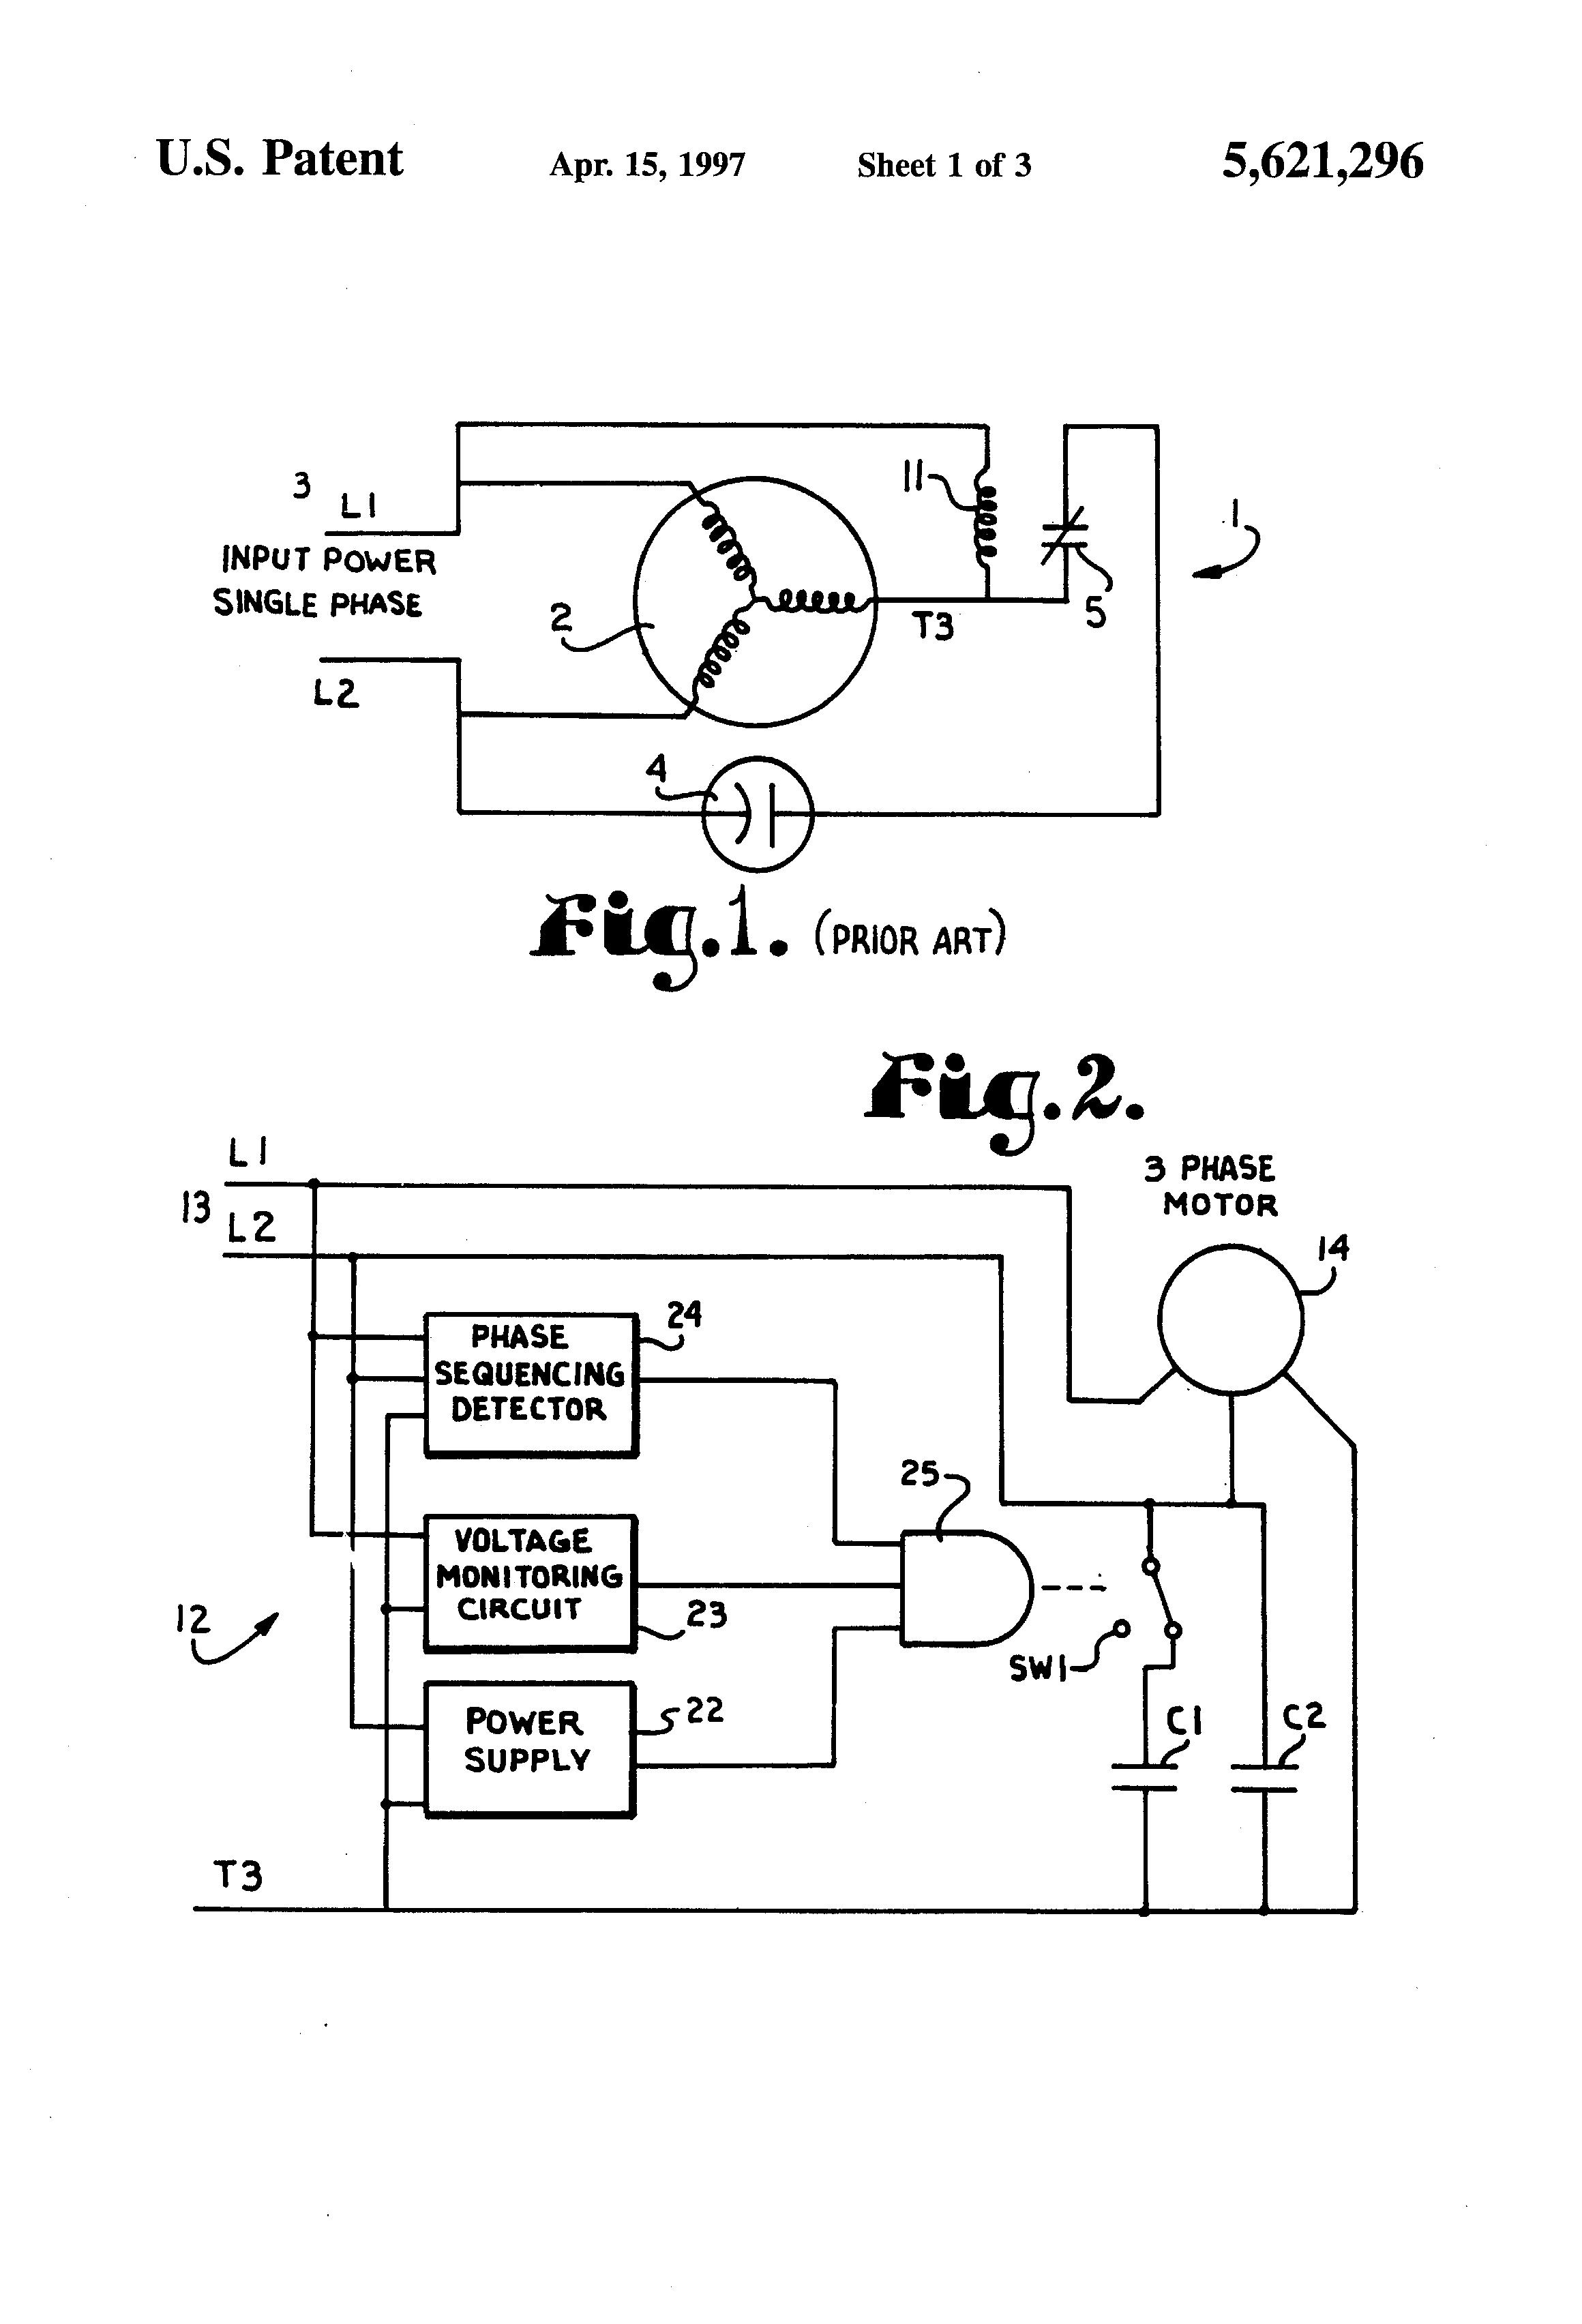 fleetwood rv wiring diagram   27 wiring diagram images